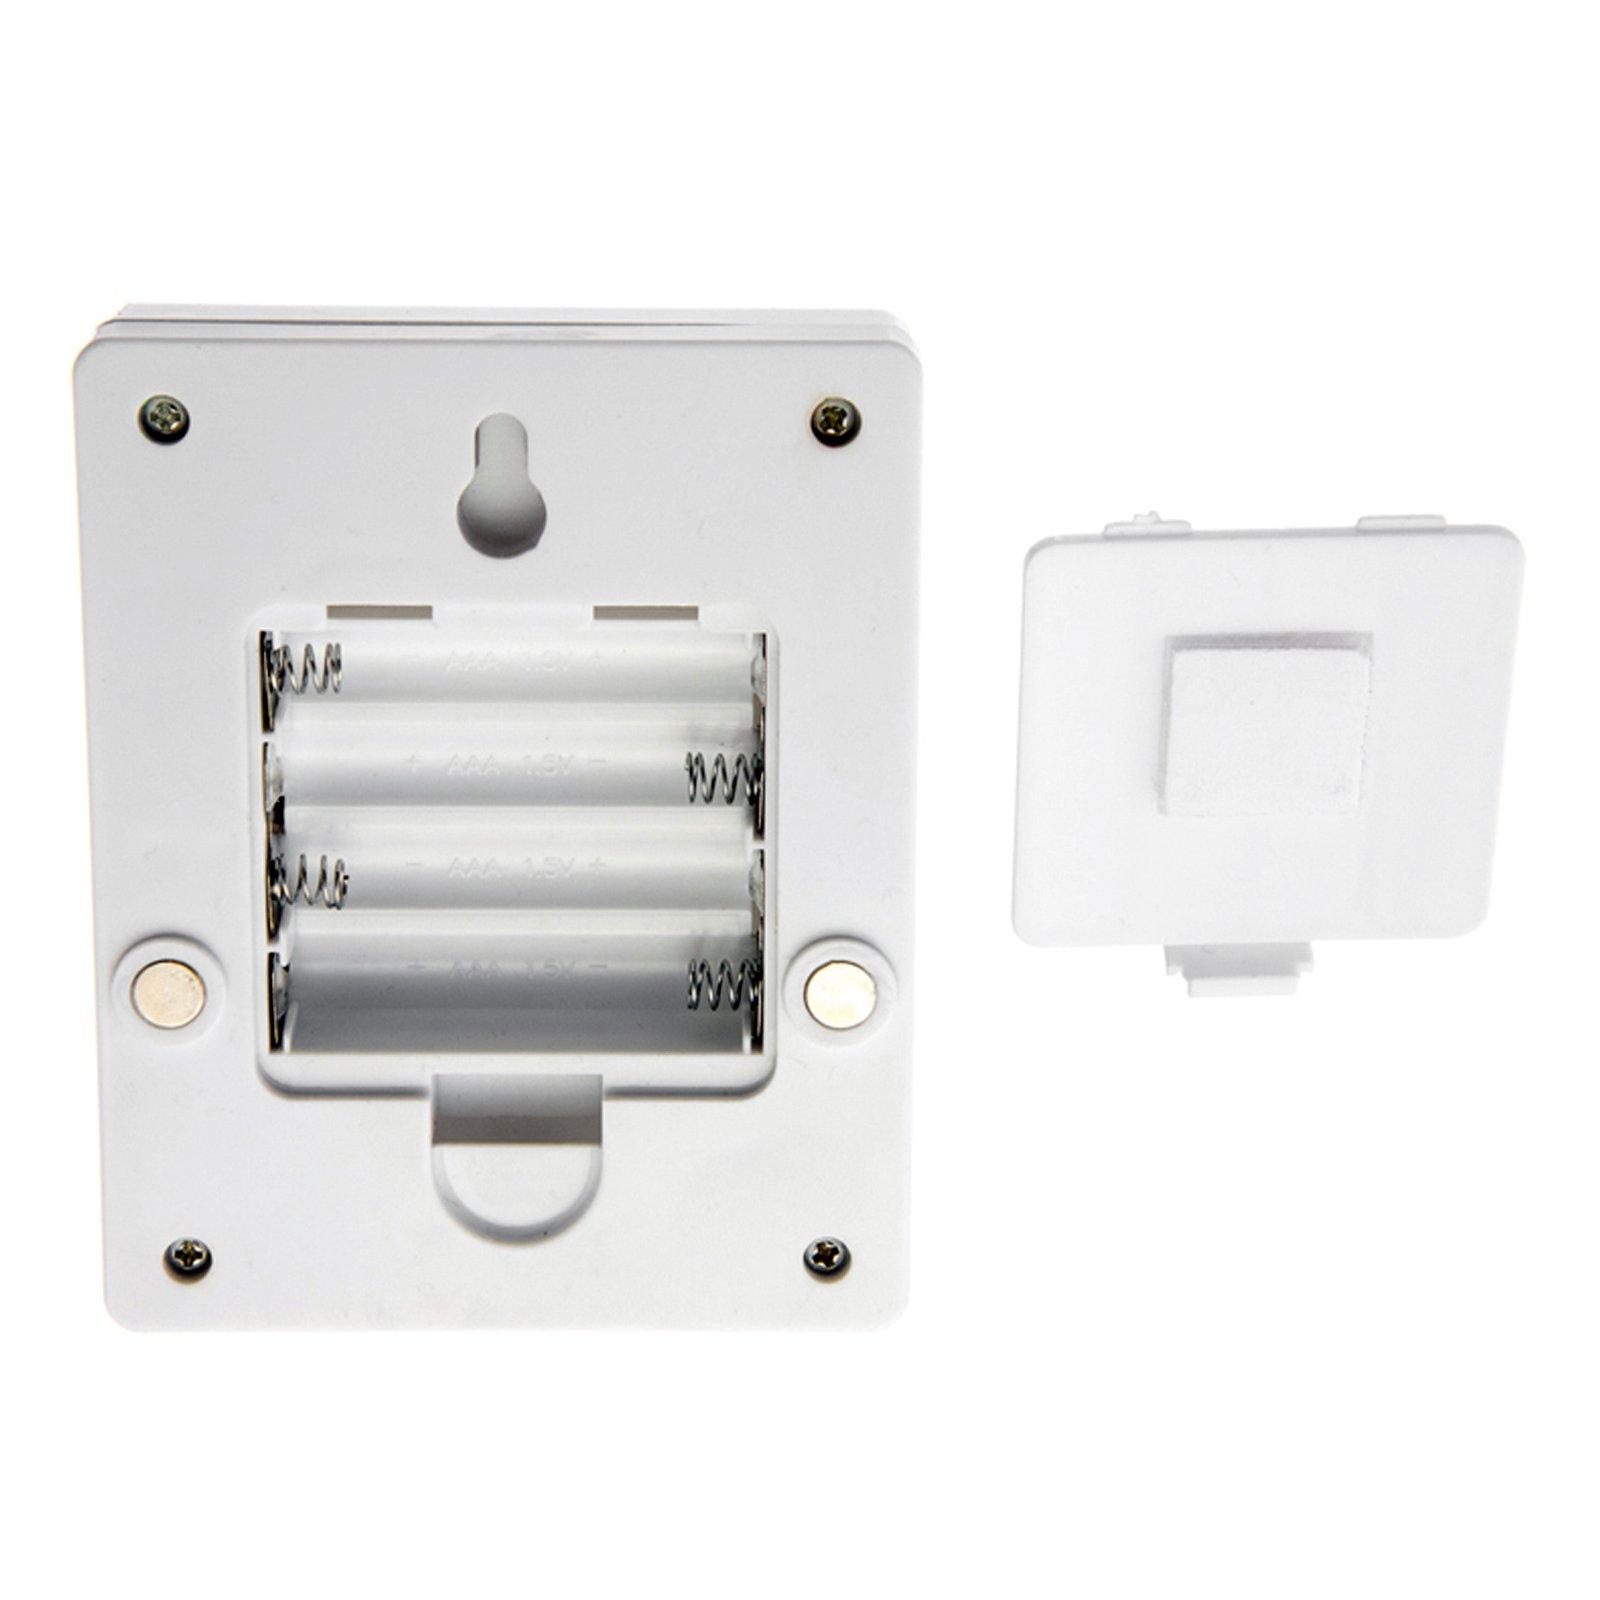 Universal Home 90 Lumen 3 Watt Wall Switch Light with Magnet Adhesive Mounting